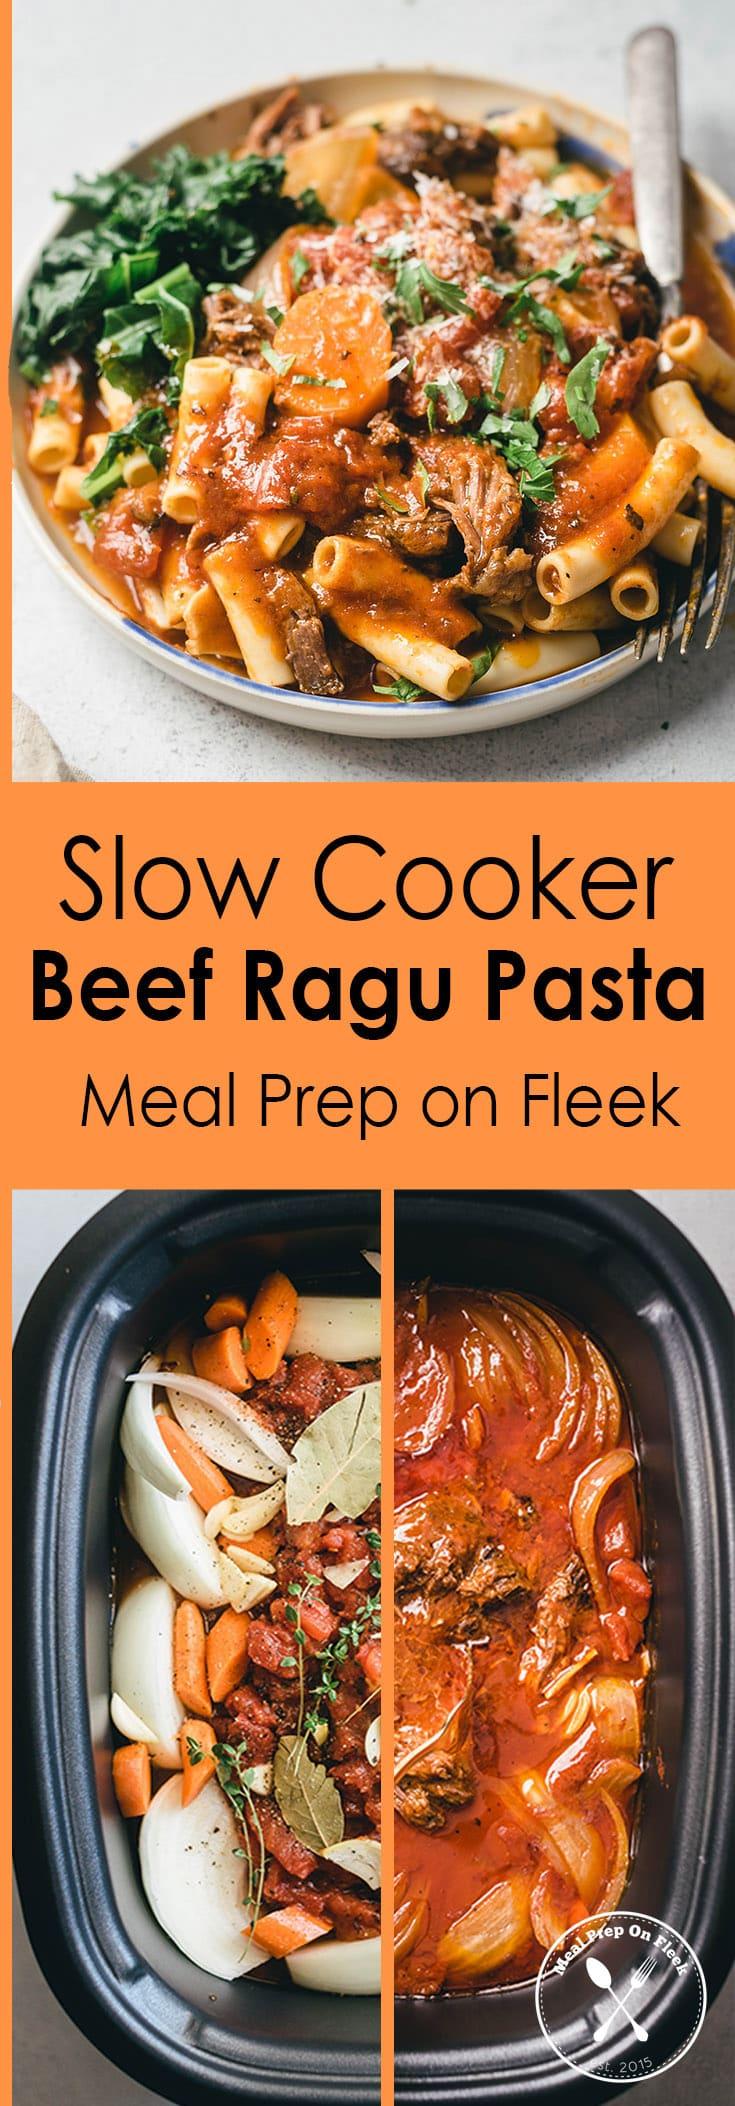 Slow Cooker Beef Ragu Pasta Meal Prep Recipe